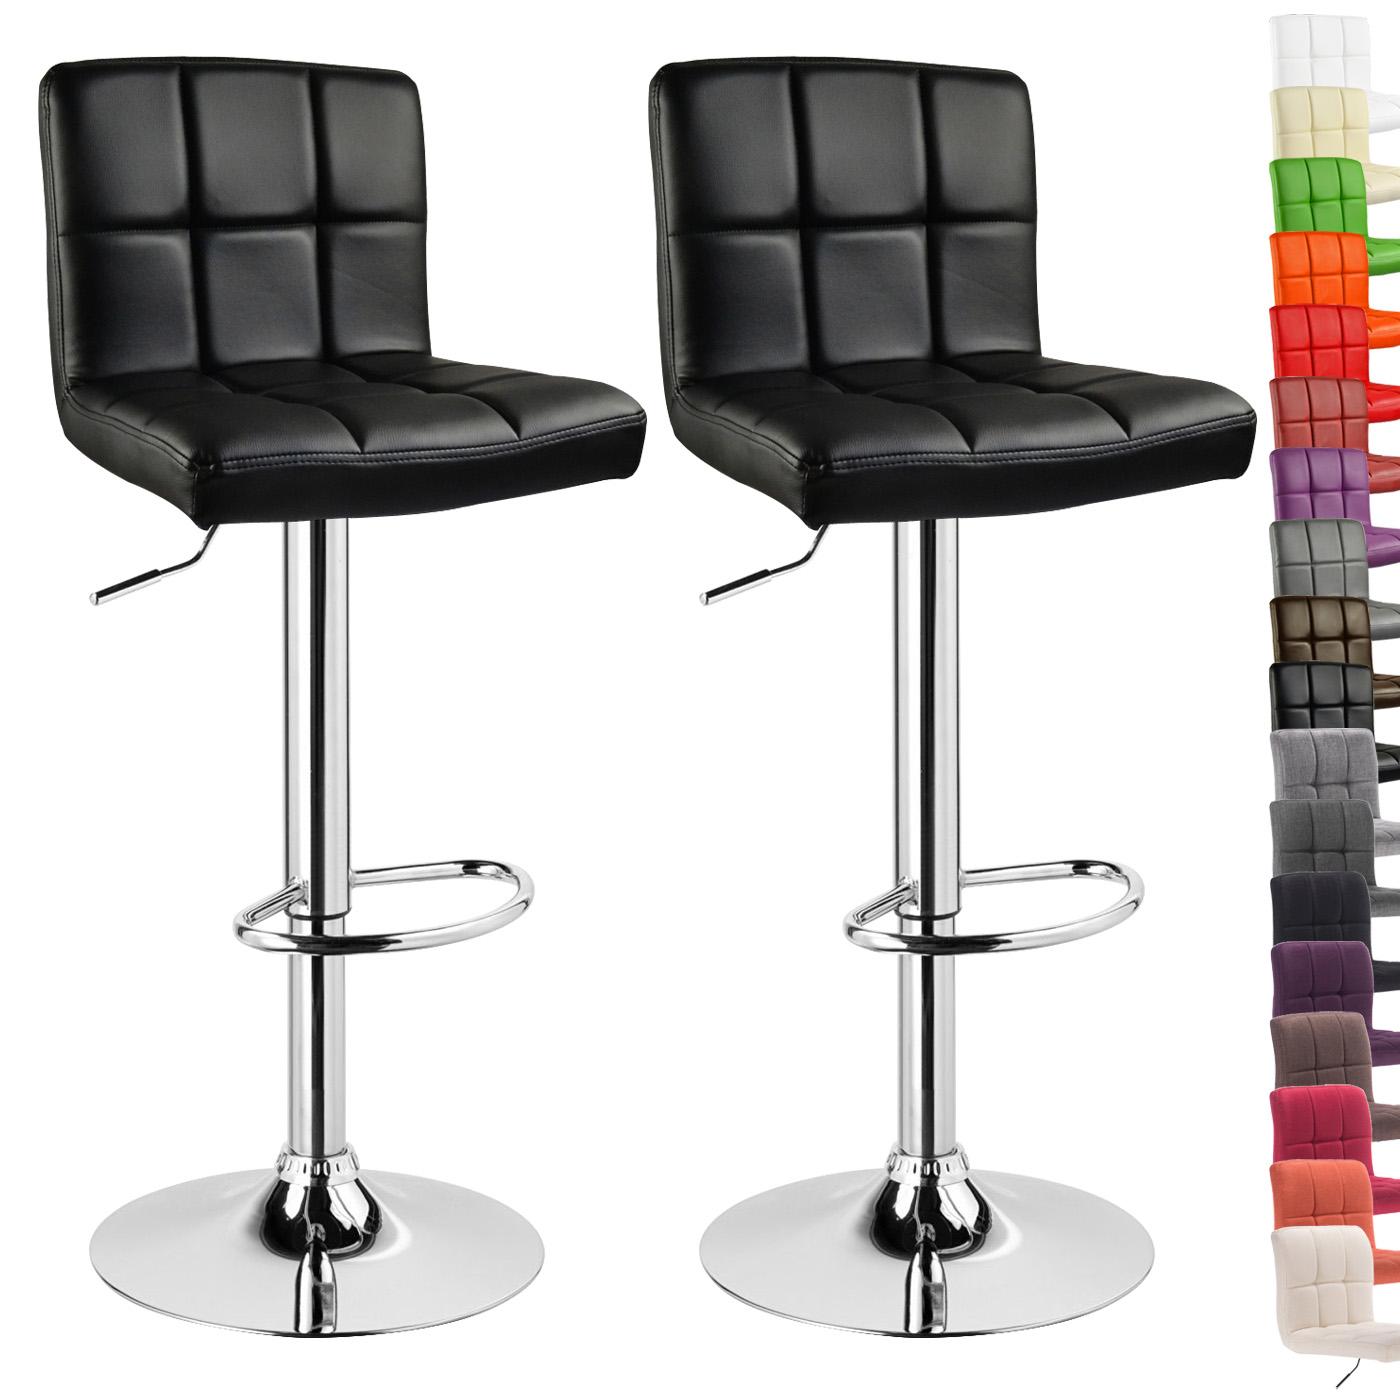 bar stools set of 2 adjustable kitchen breakfast stool chair